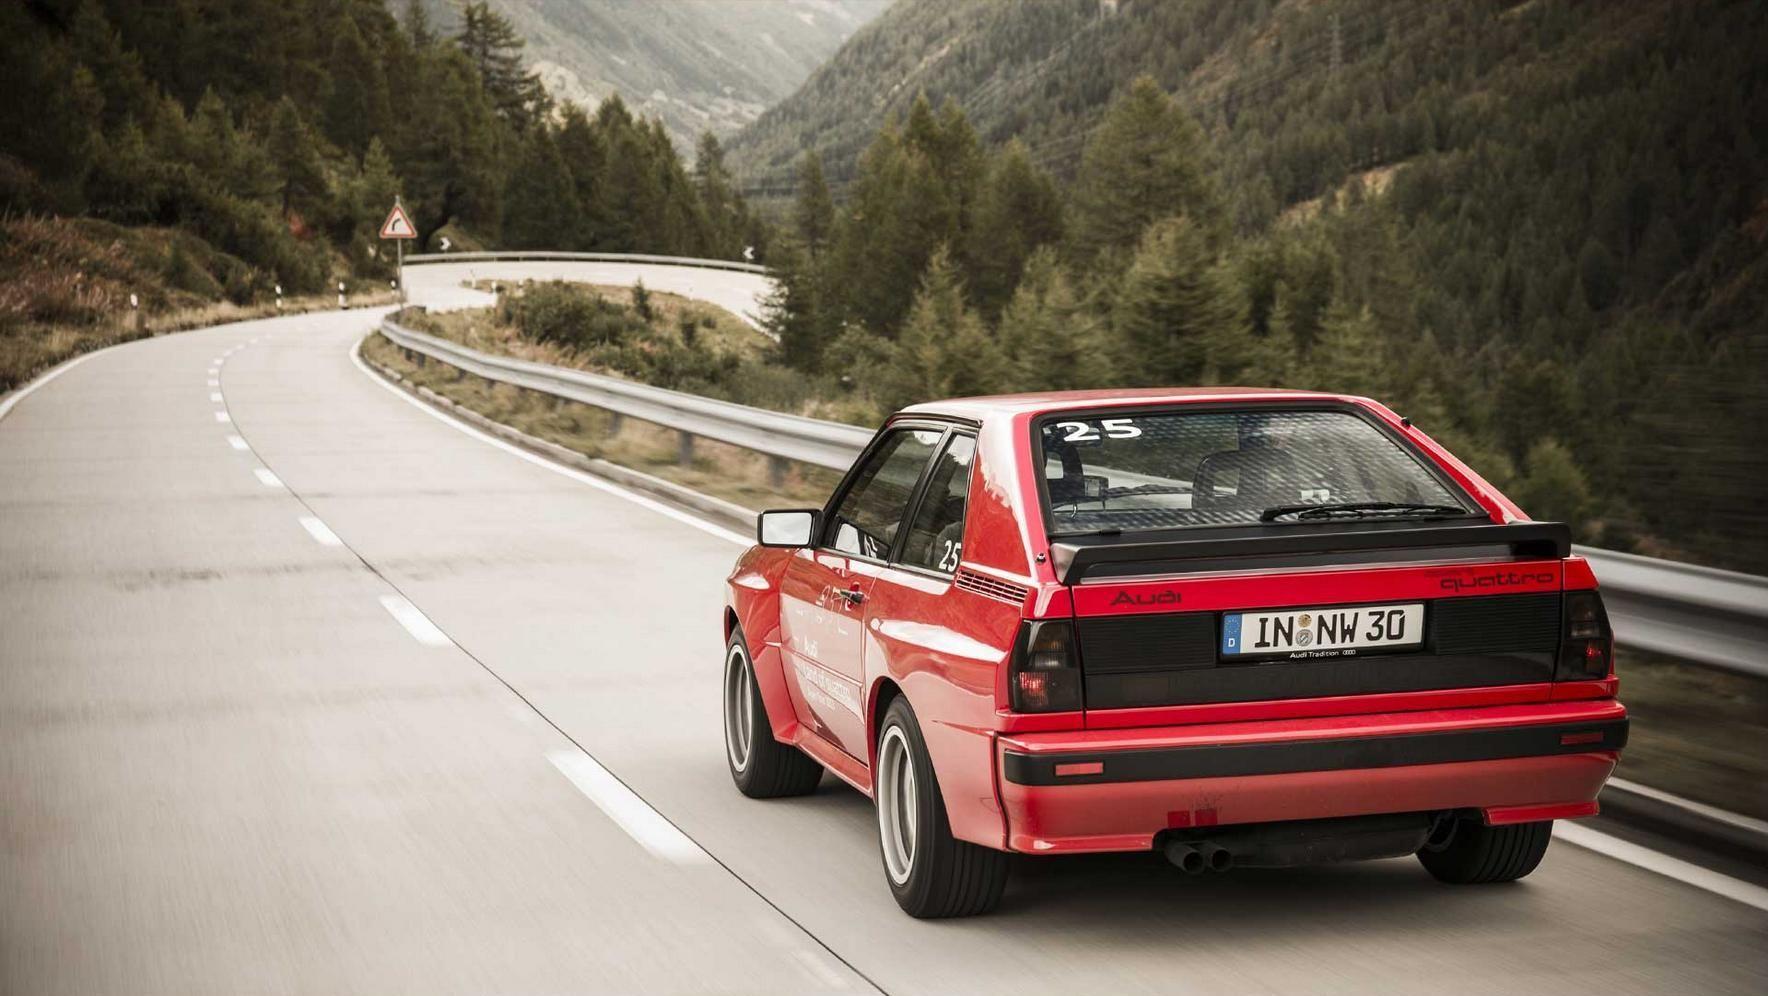 1984 Audi Sport Quattro 1770 X 1000 Hq Backgrounds Hd Wallpapers Gallery Gallsource Com Audi Sport Audi Quattro Turbo Car